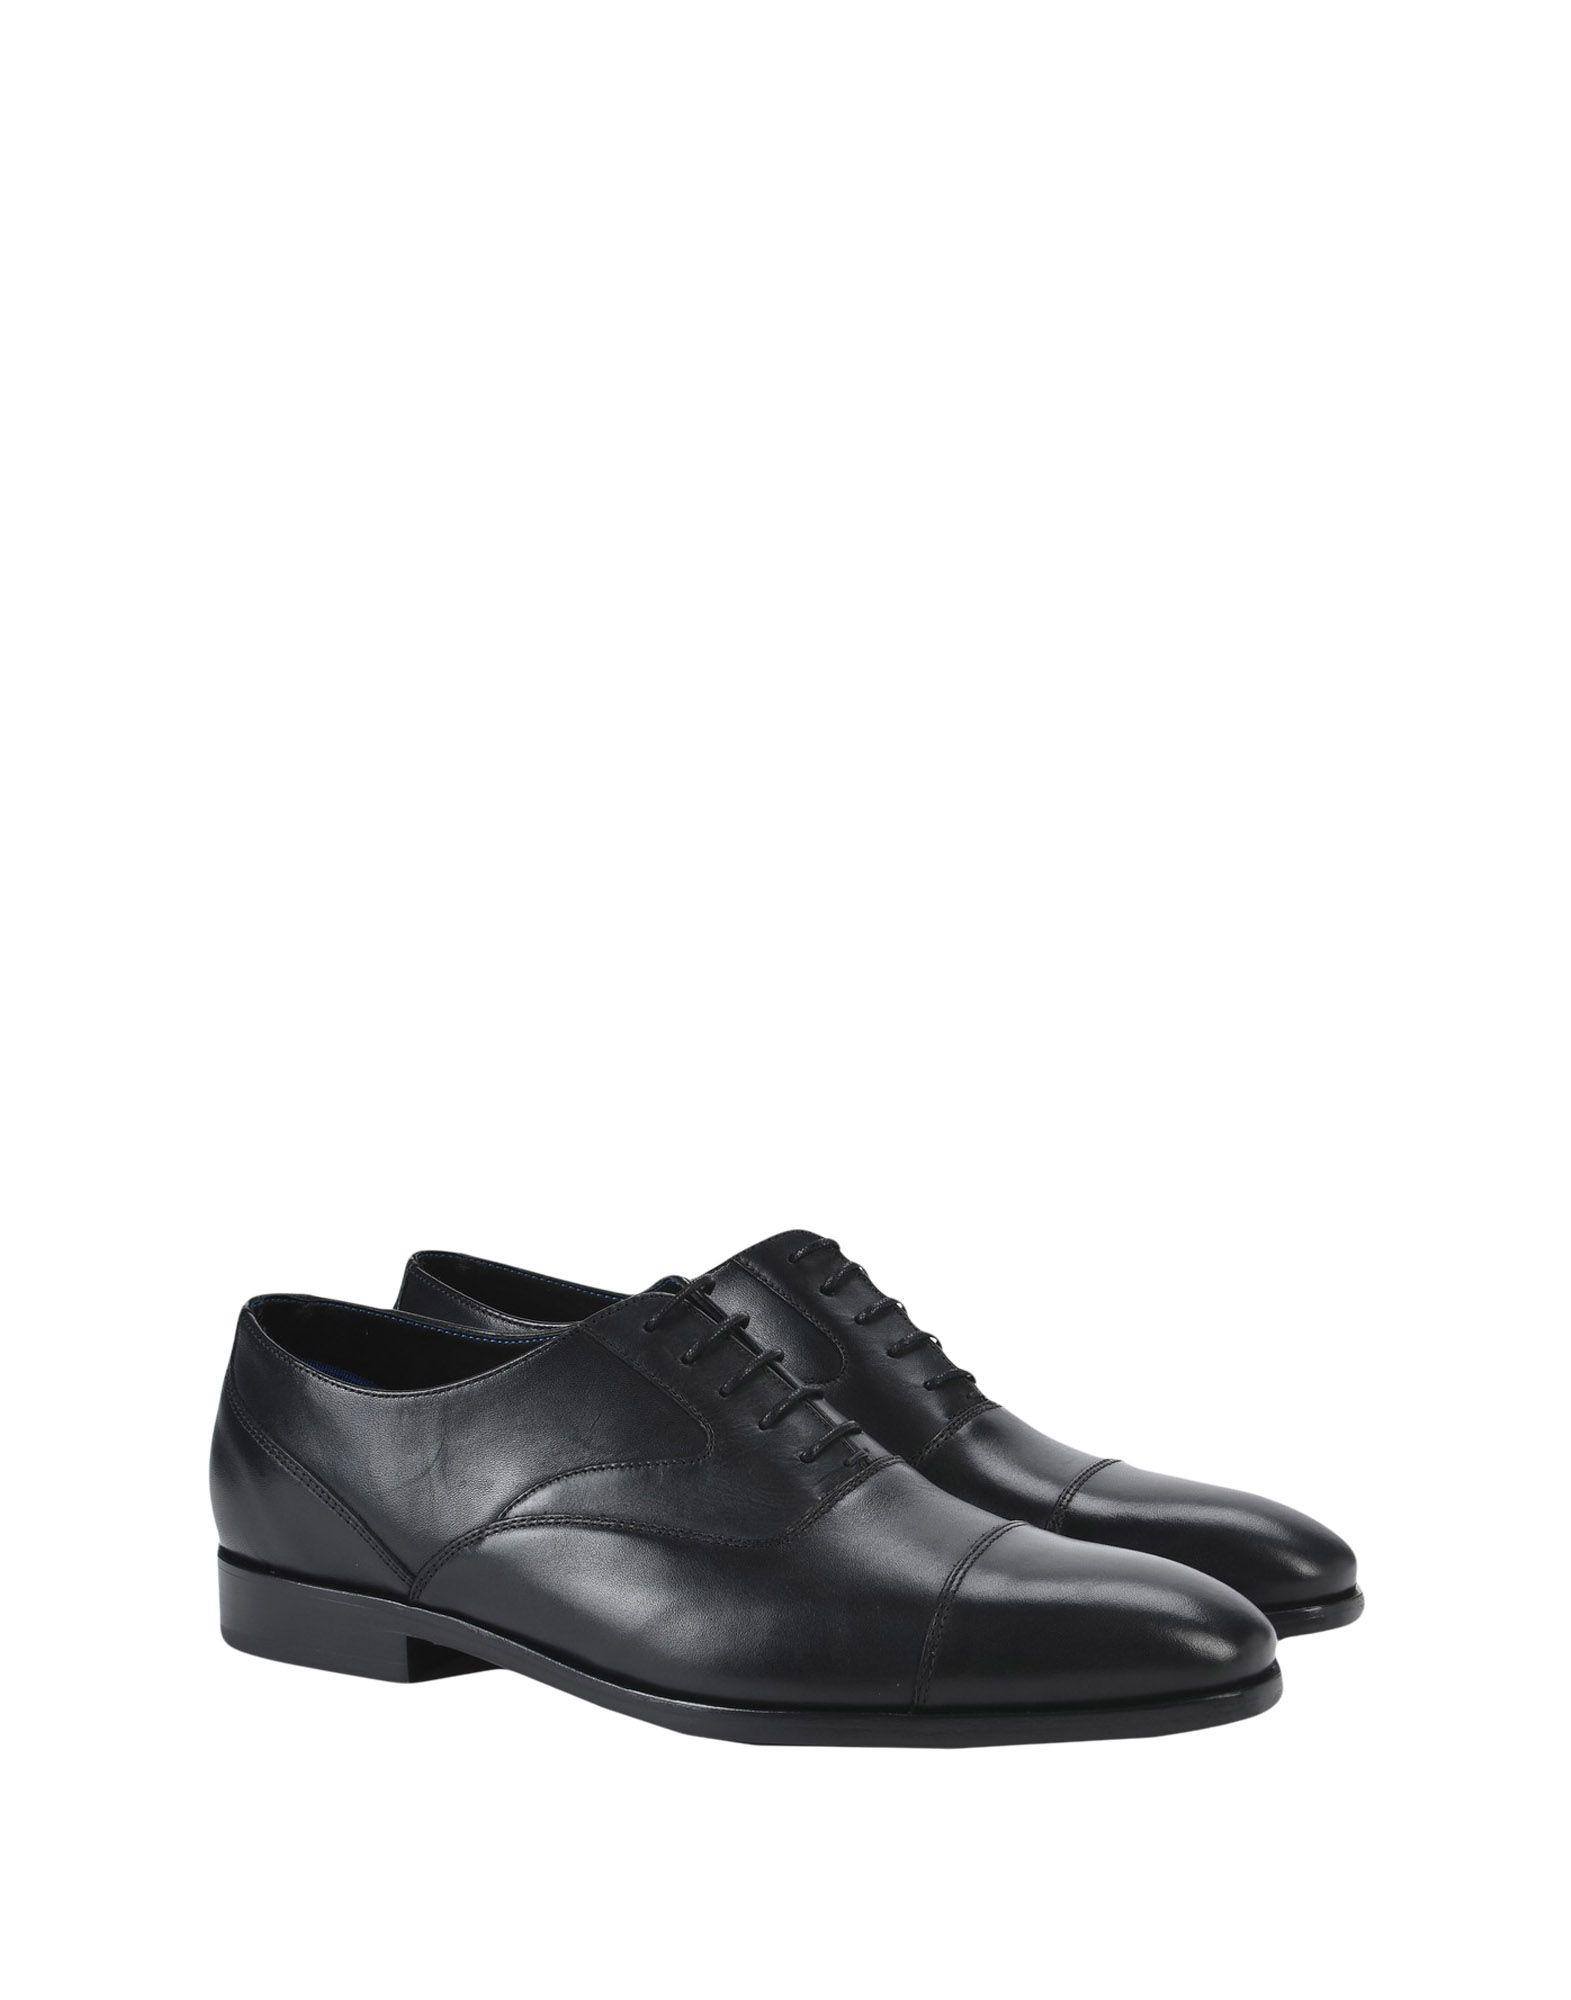 Ps By Paul Smith Schnürschuhe Herren  Schuhe 11503769PG Gute Qualität beliebte Schuhe  6626b6